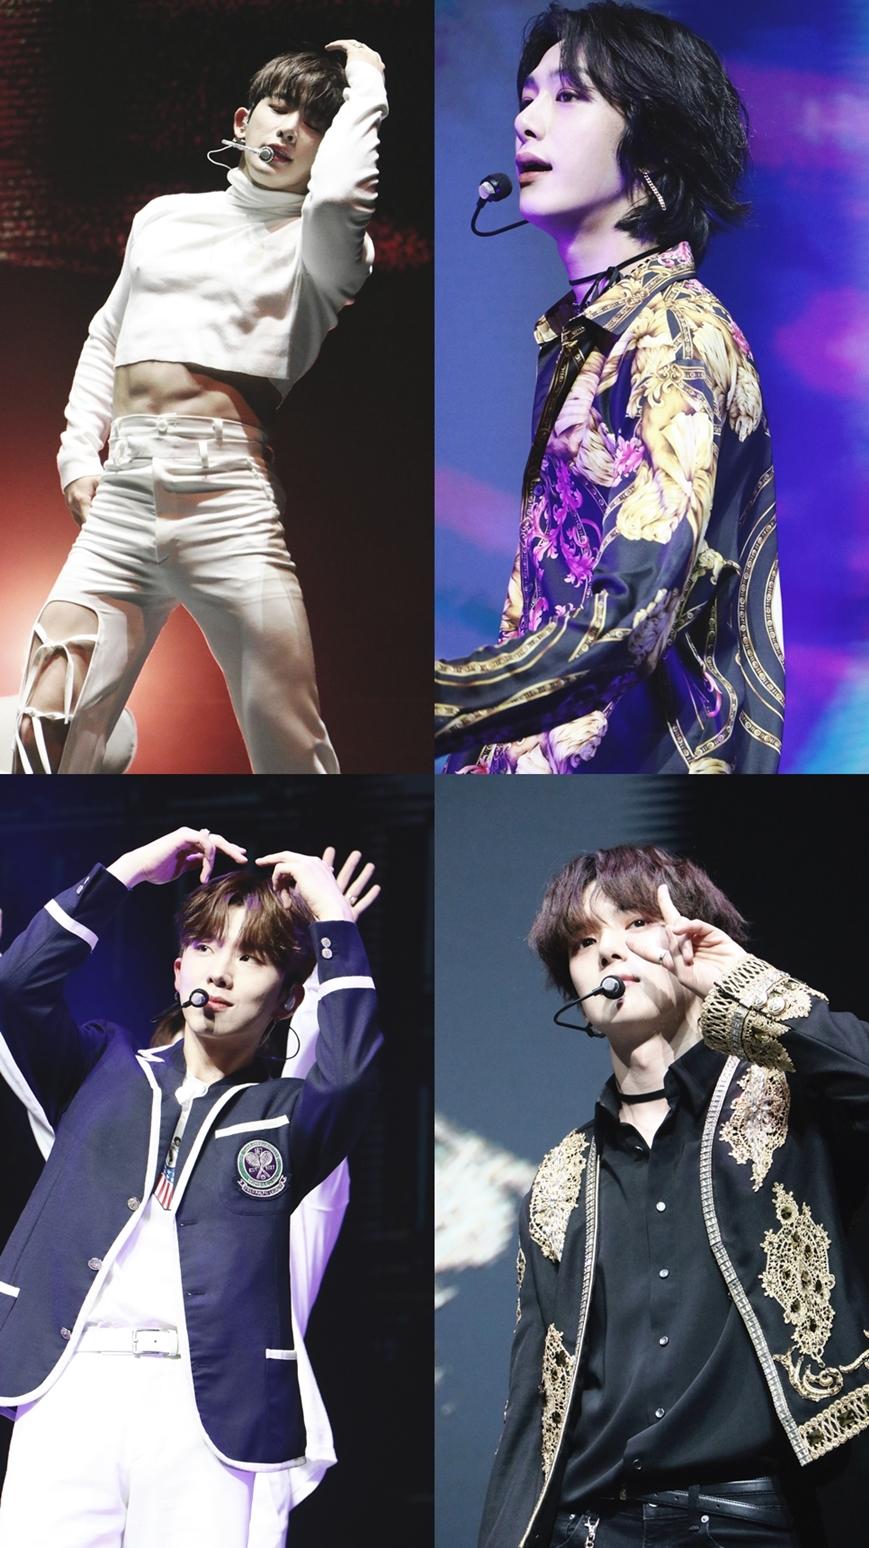 monsta x, monsta x profile, monsta x facts, monsta x leader, monsta x comeback, monsta x world tour, world tour, monsta x starship